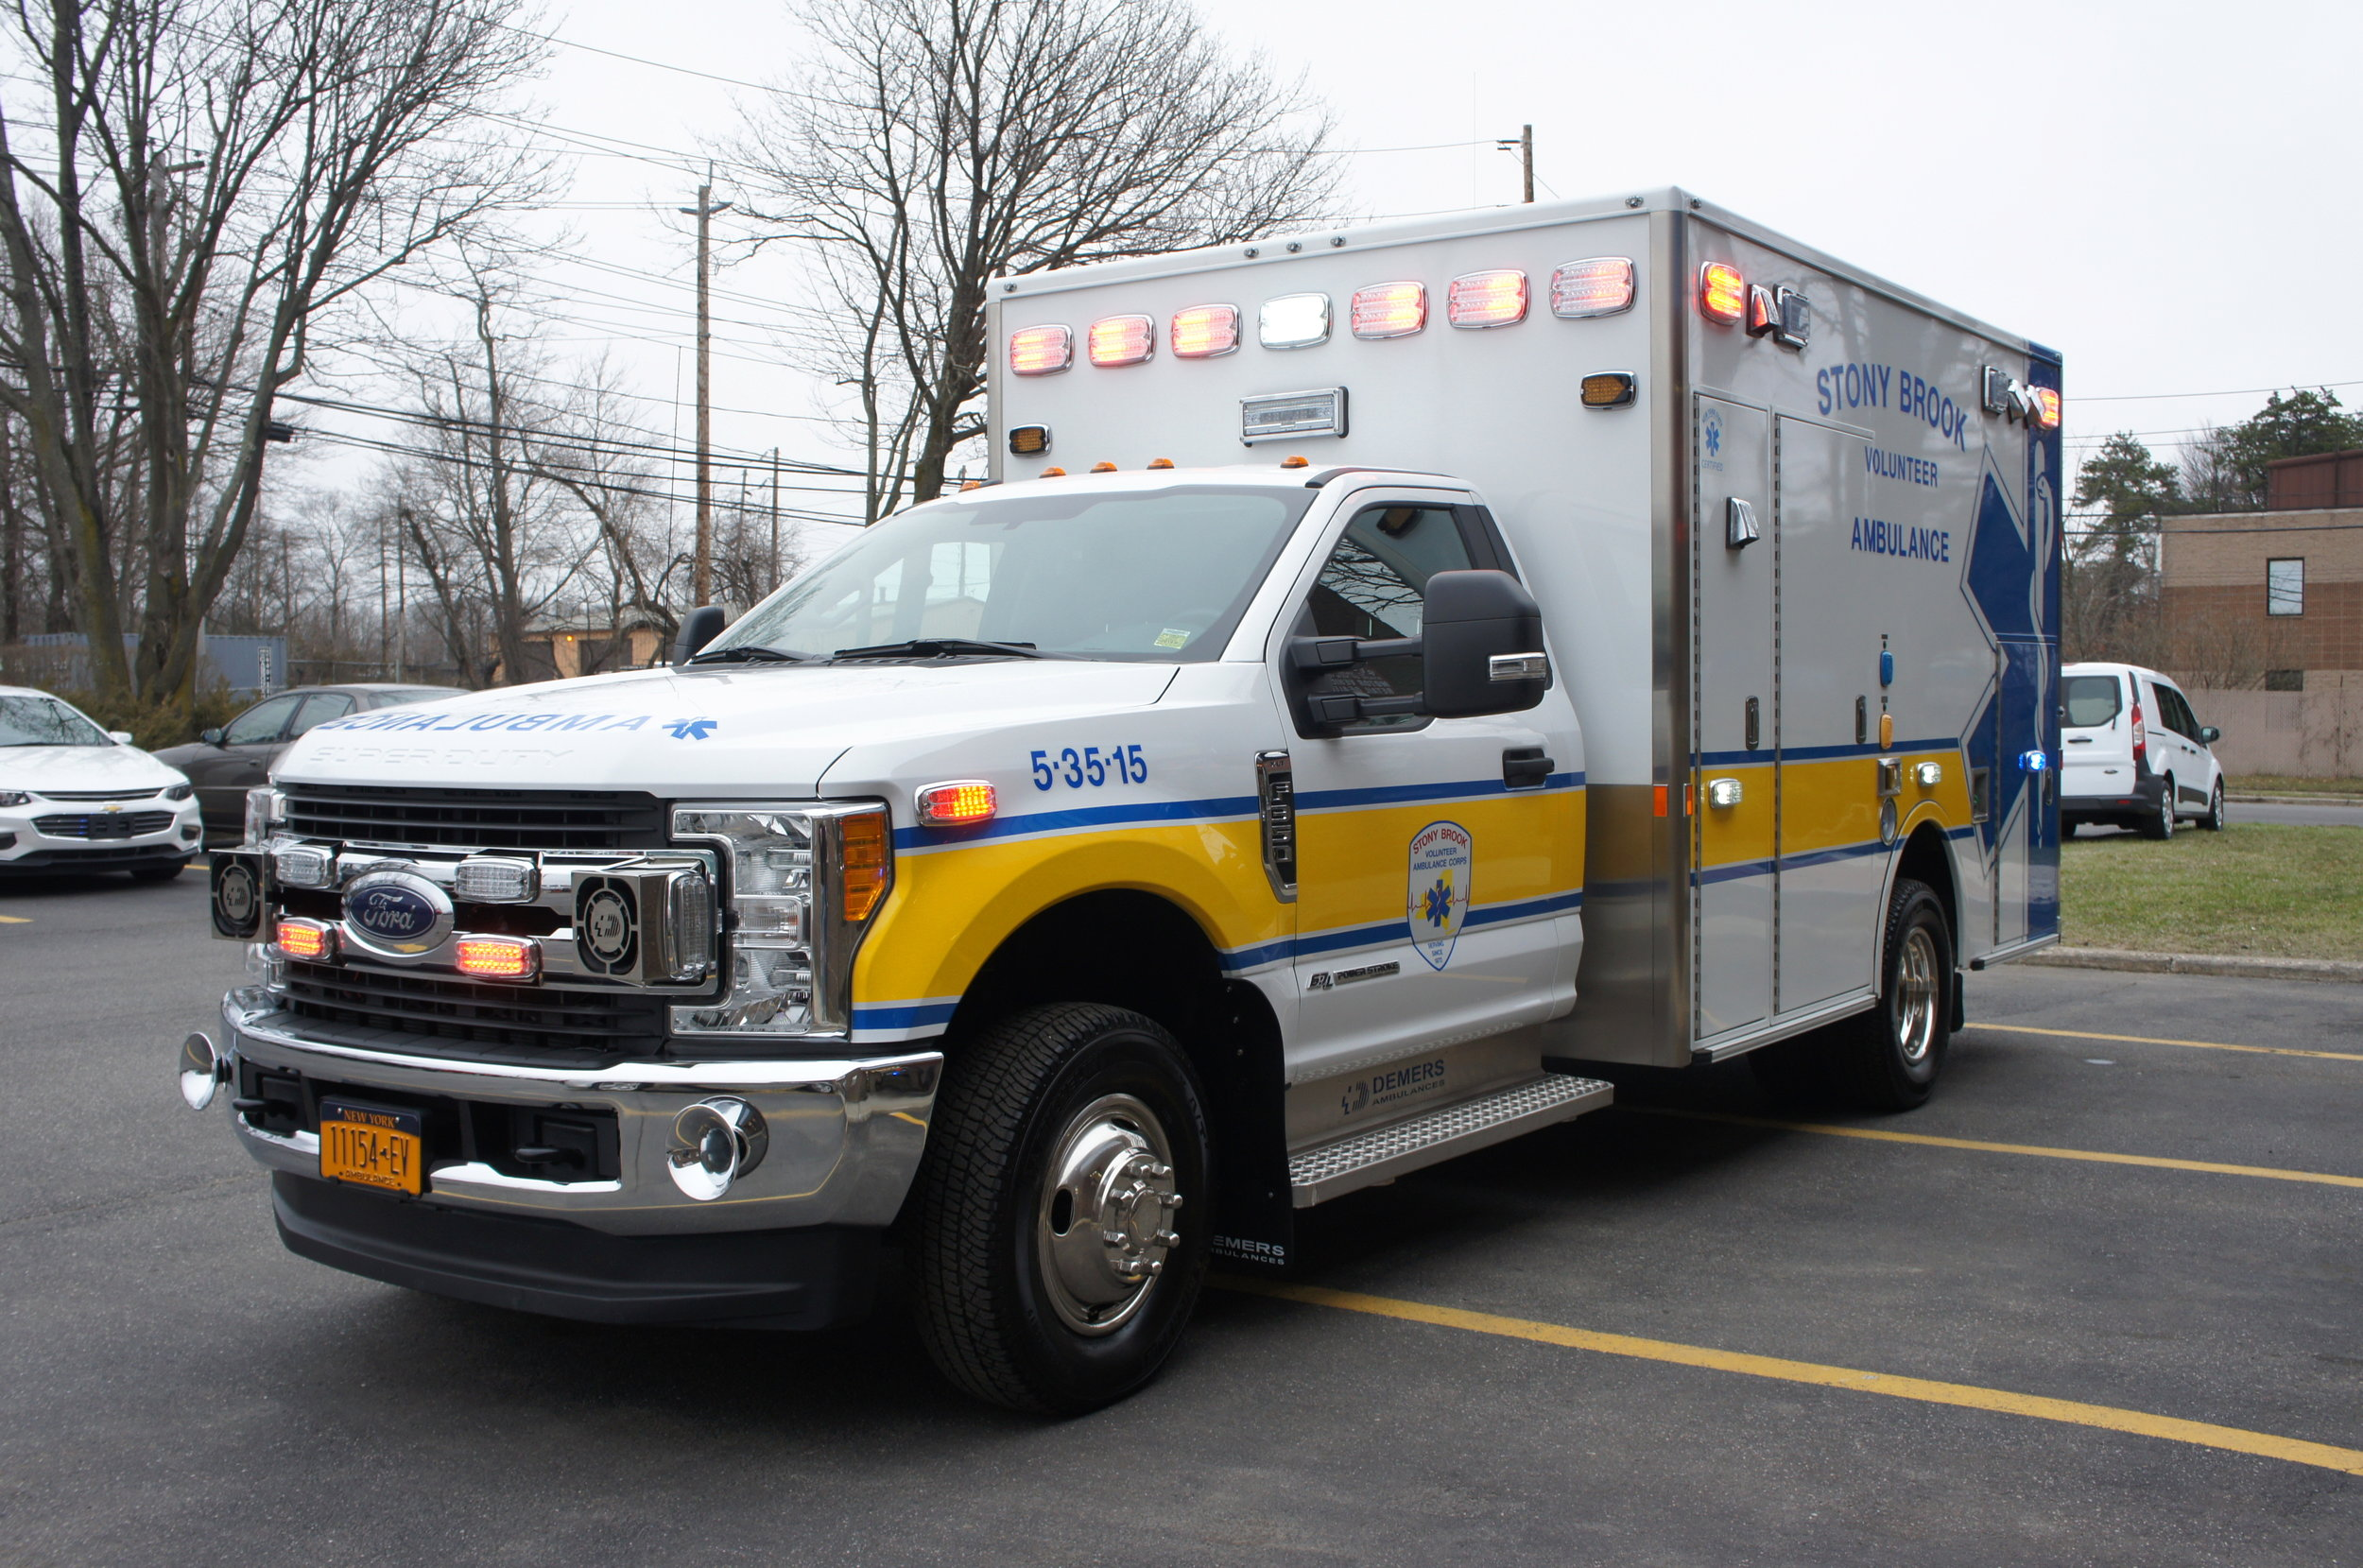 stony brook college ambulance